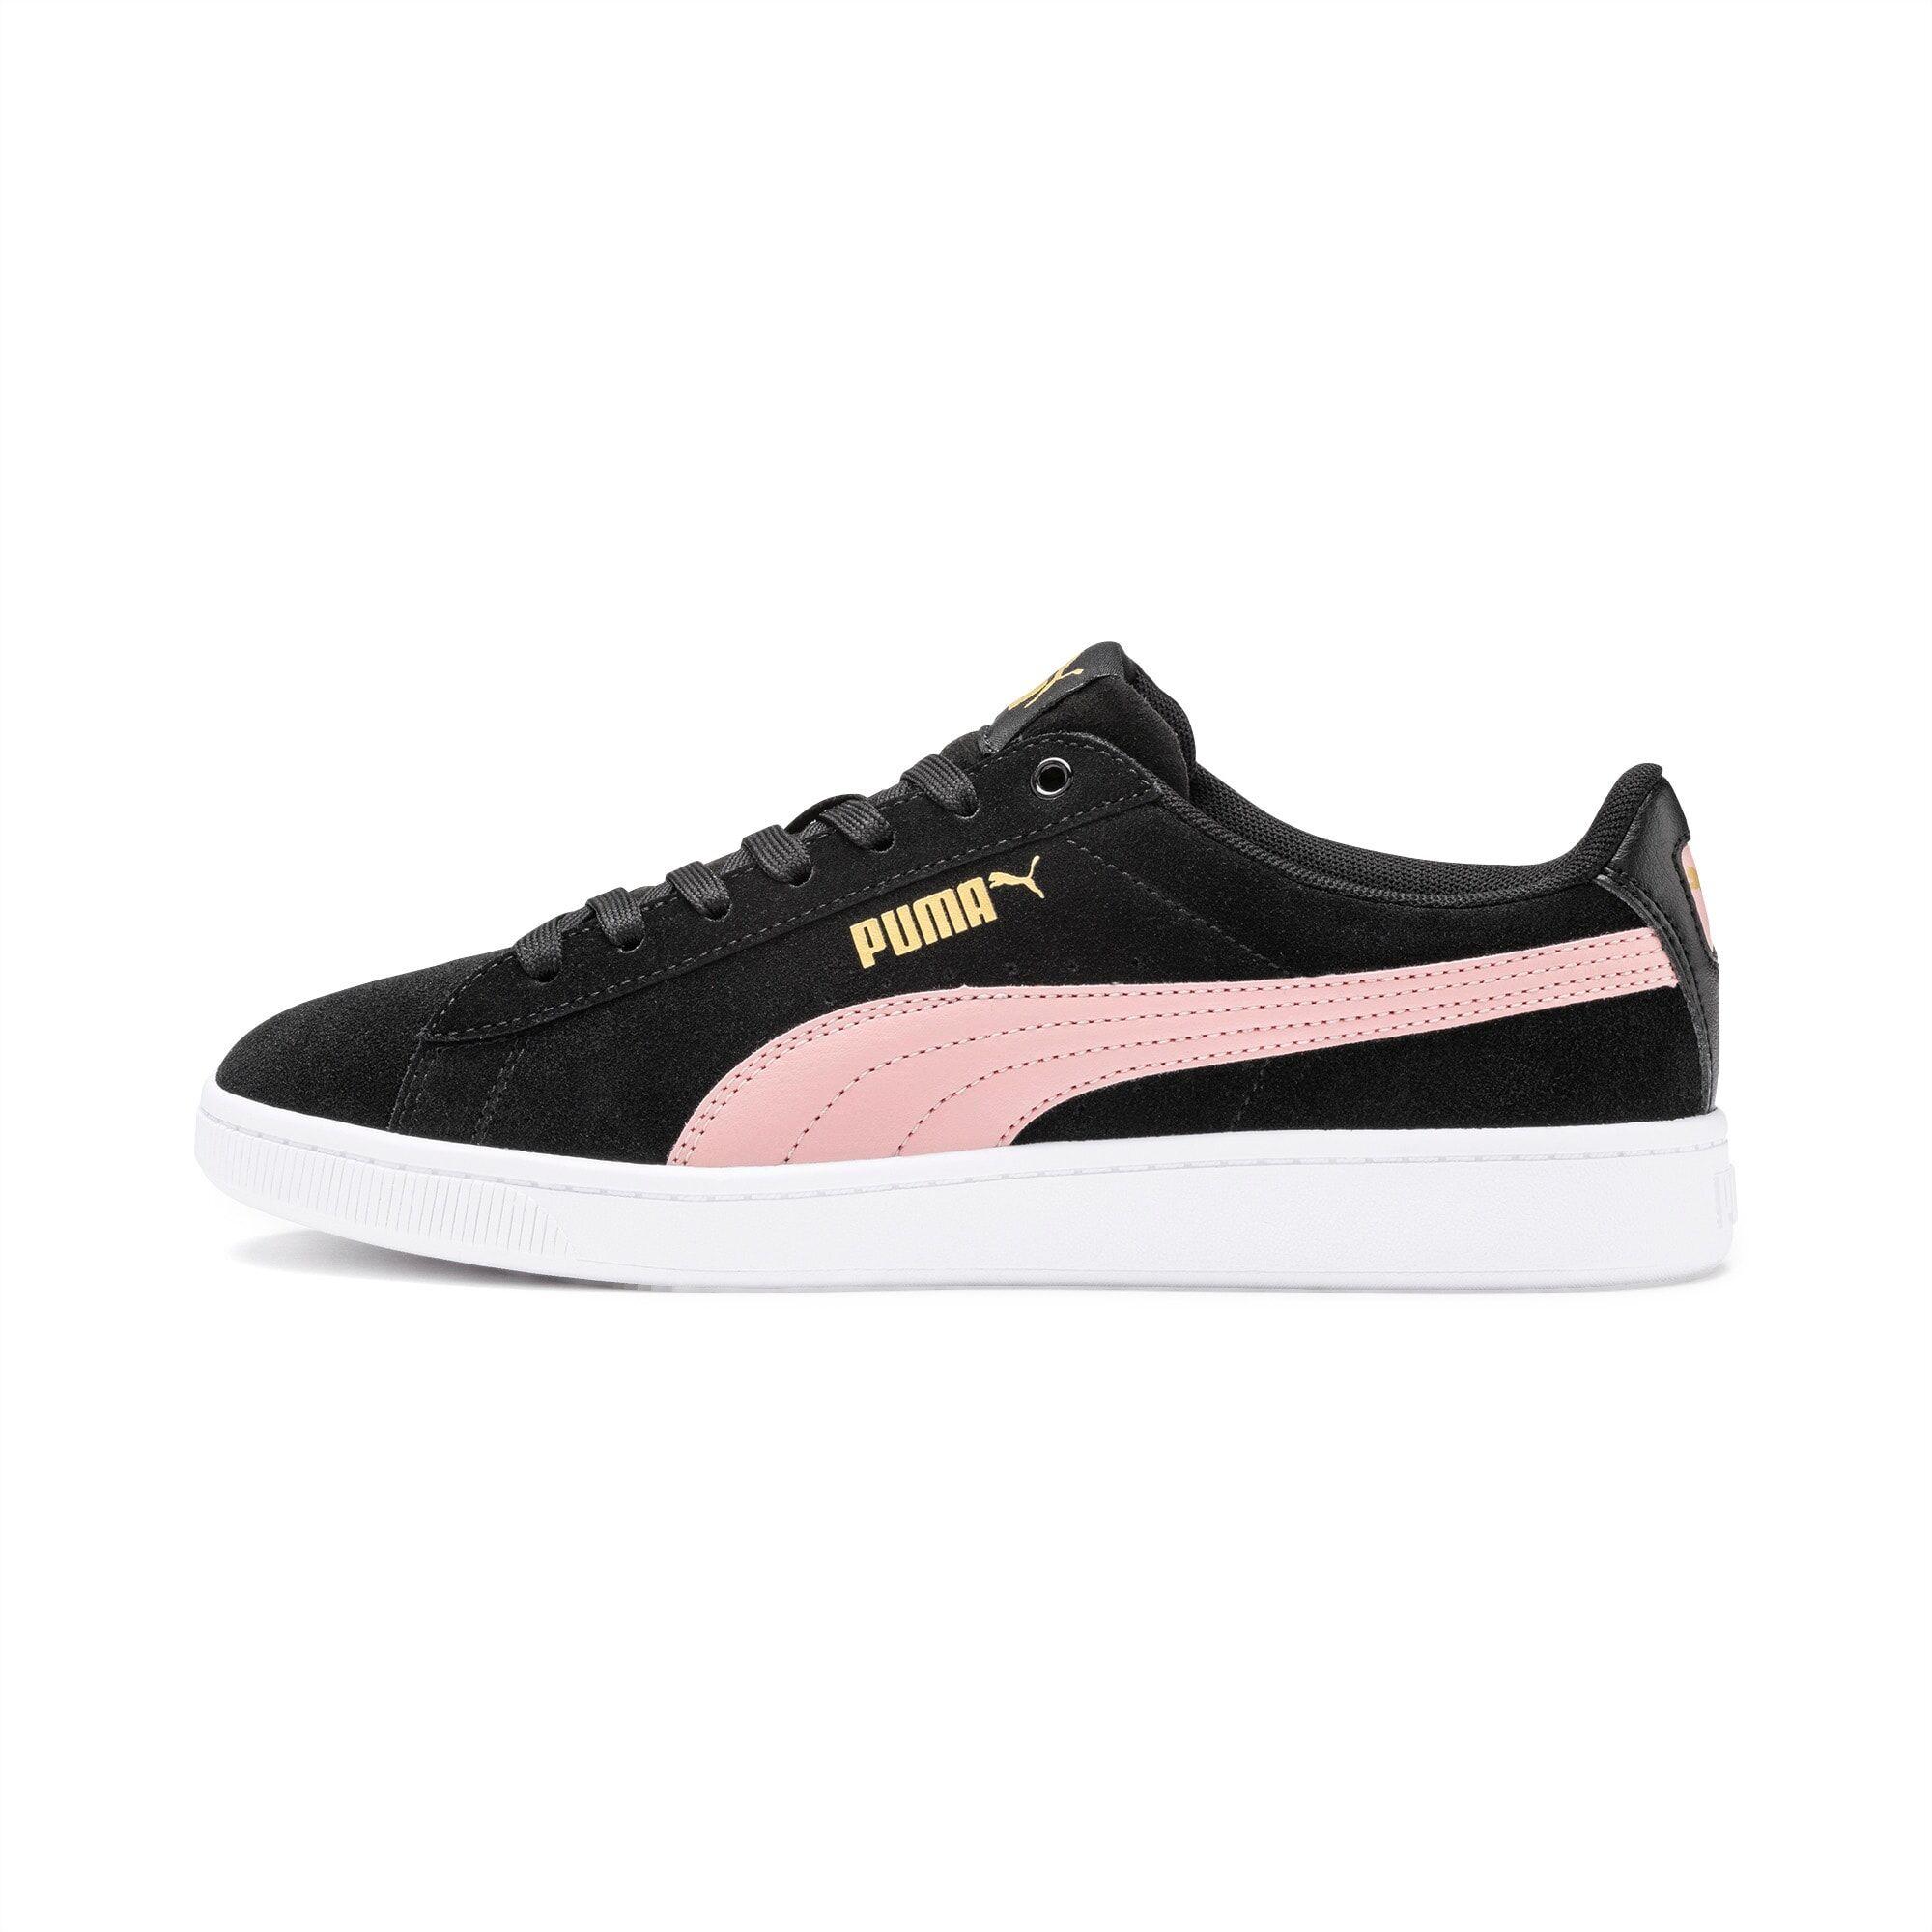 PUMA Chaussure Basket Vikky v2 pour Femme, Blanc/Rose/Noir, Taille 37, Chaussures